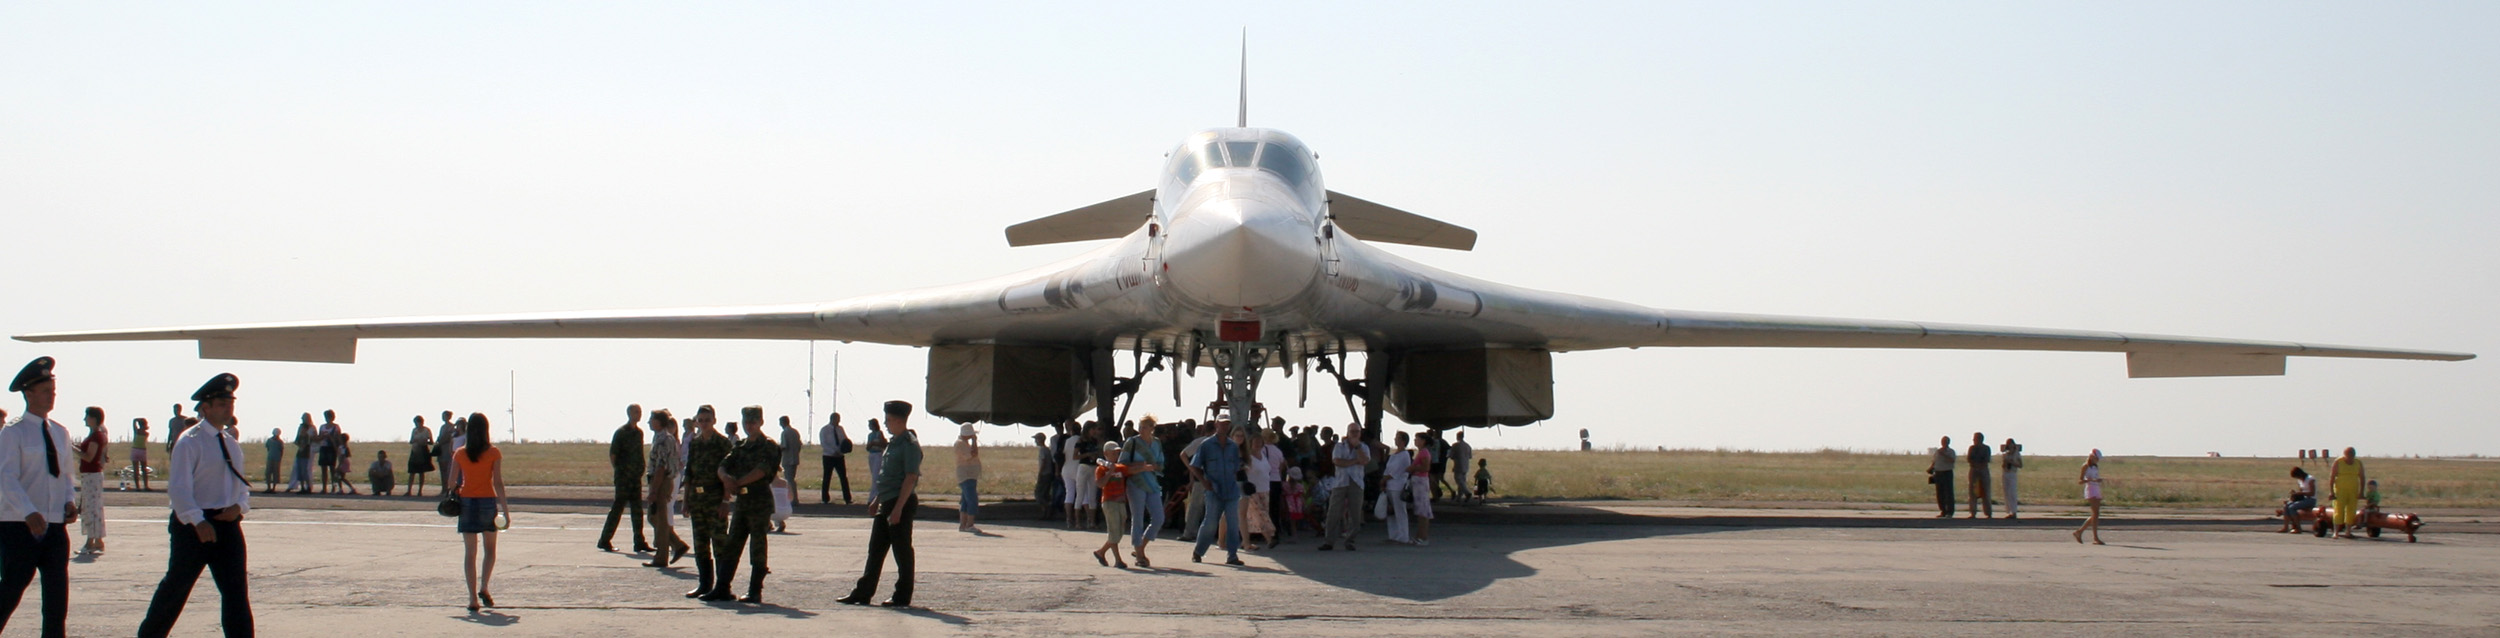 Энгельс Ту-160 02 фото 3.jpg